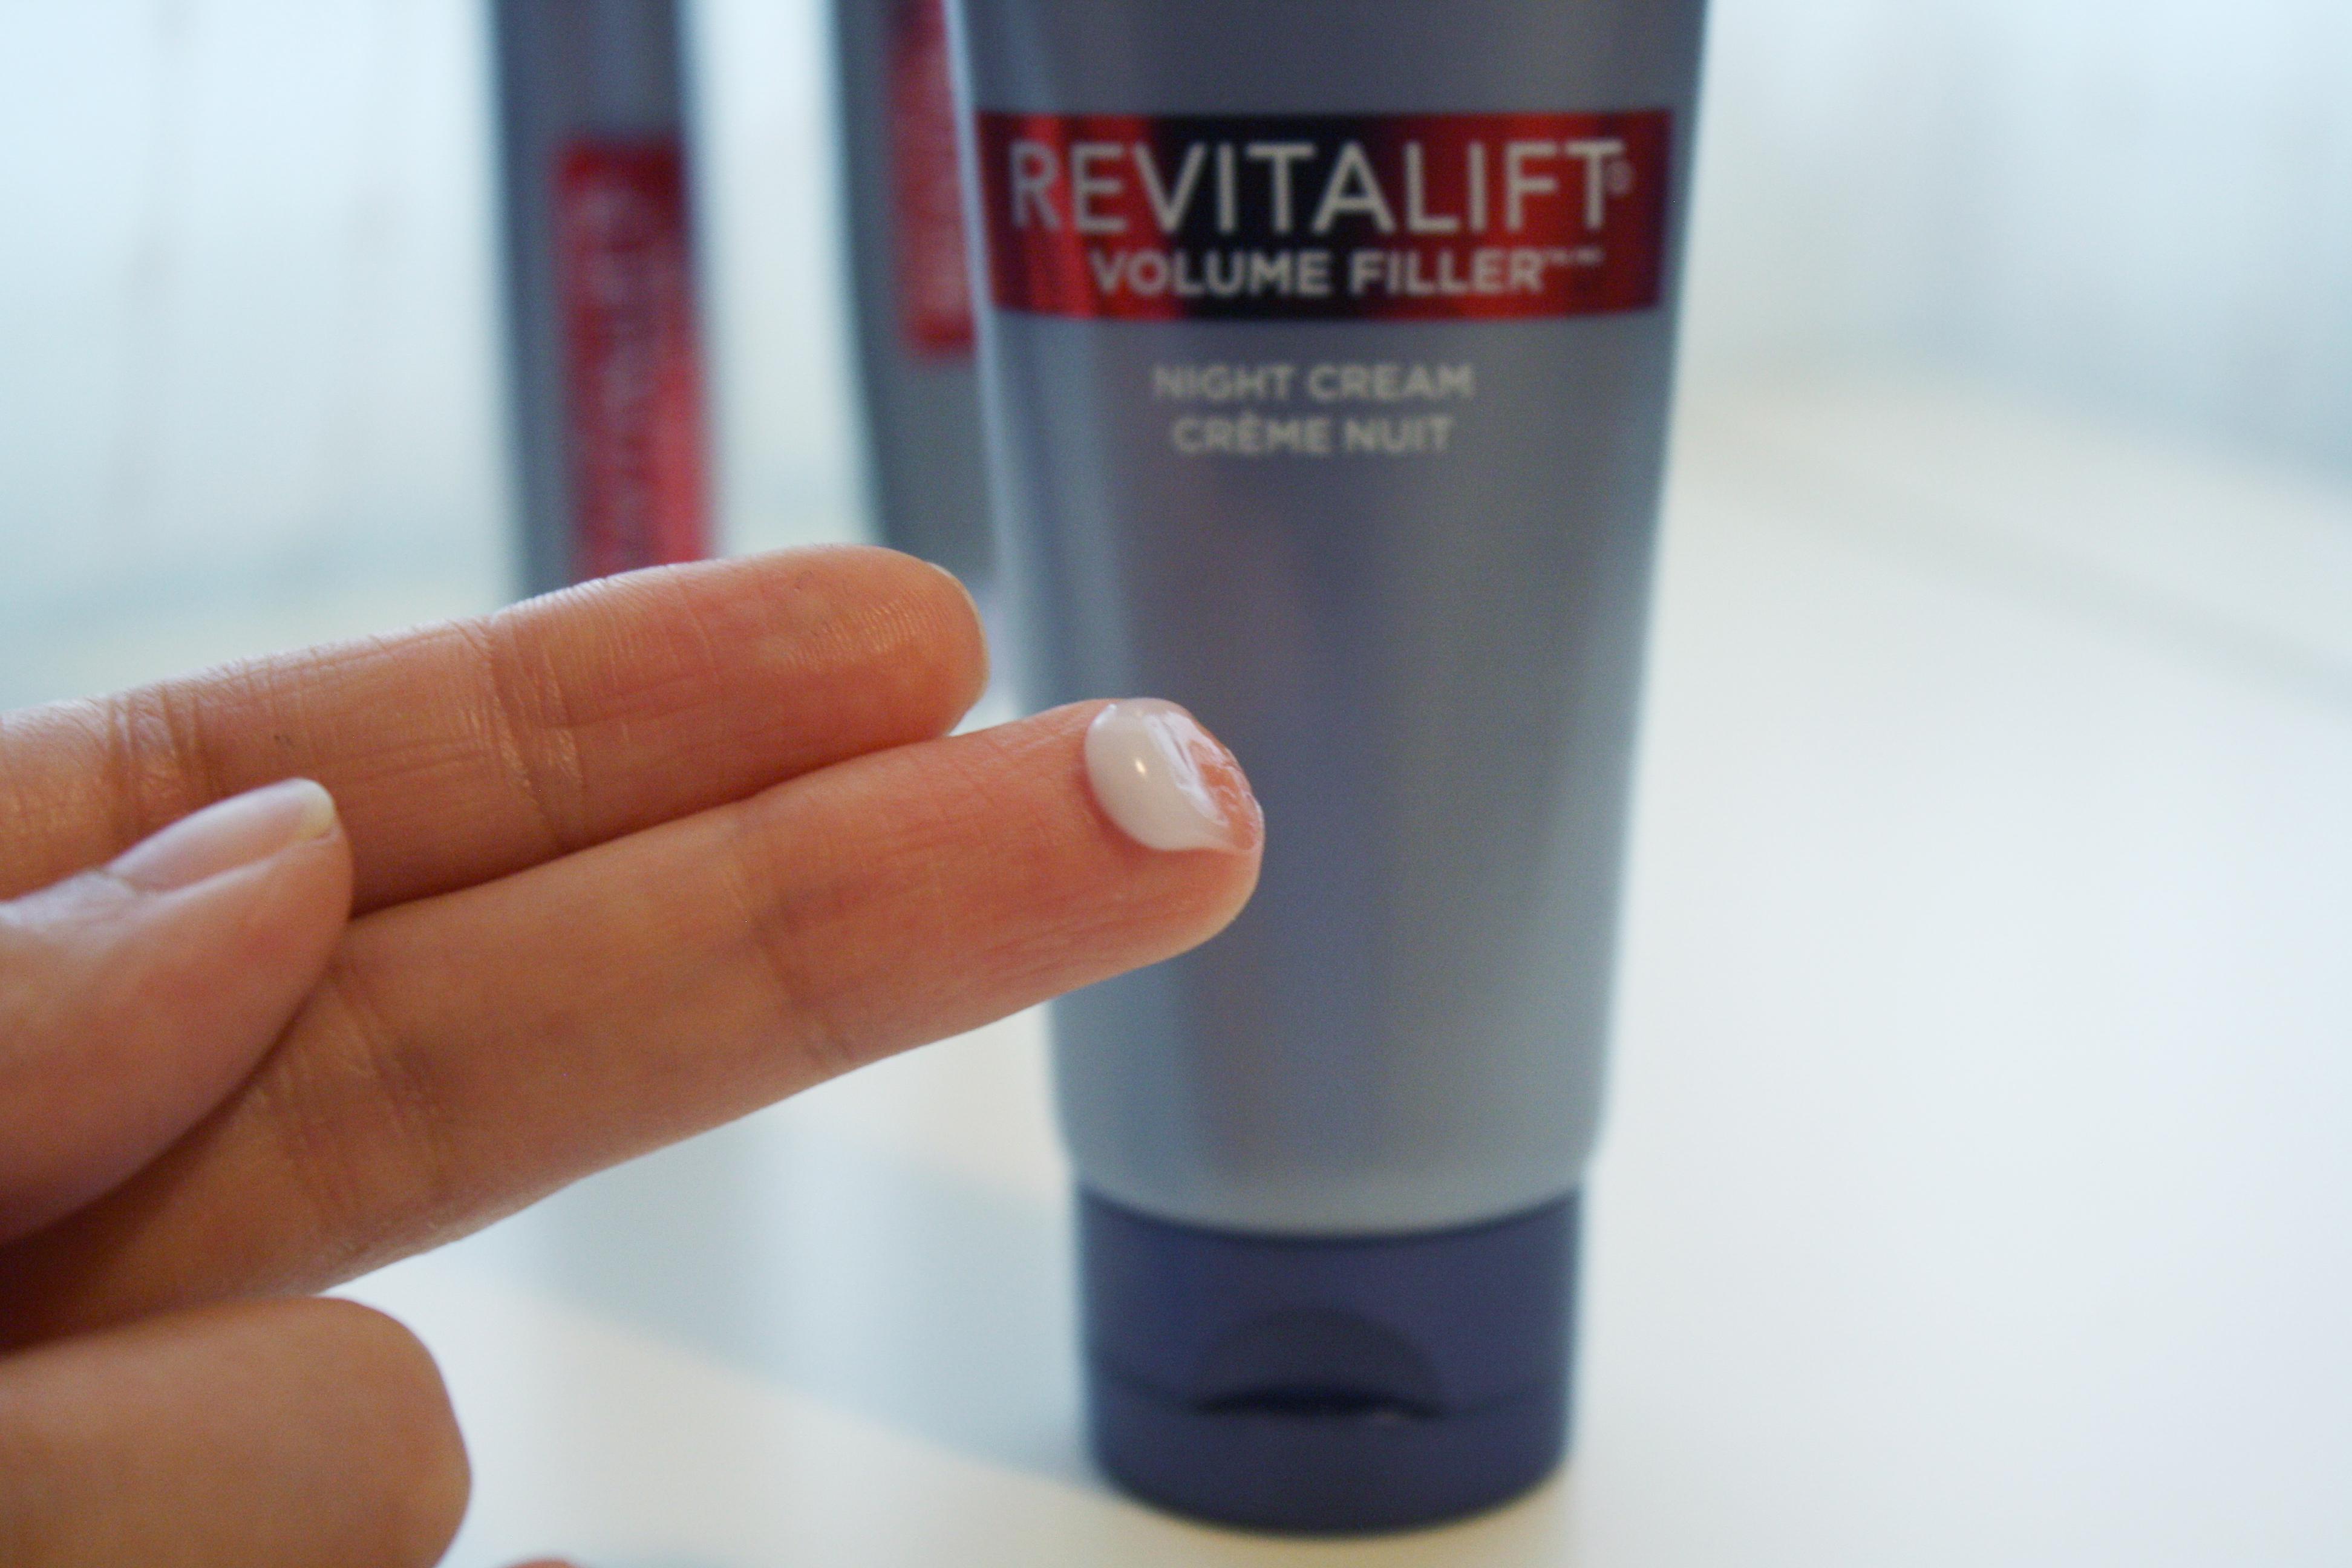 l'oreal revitalift volume filler line skincare hyaluronic acid review night cream anti-aging mature skin